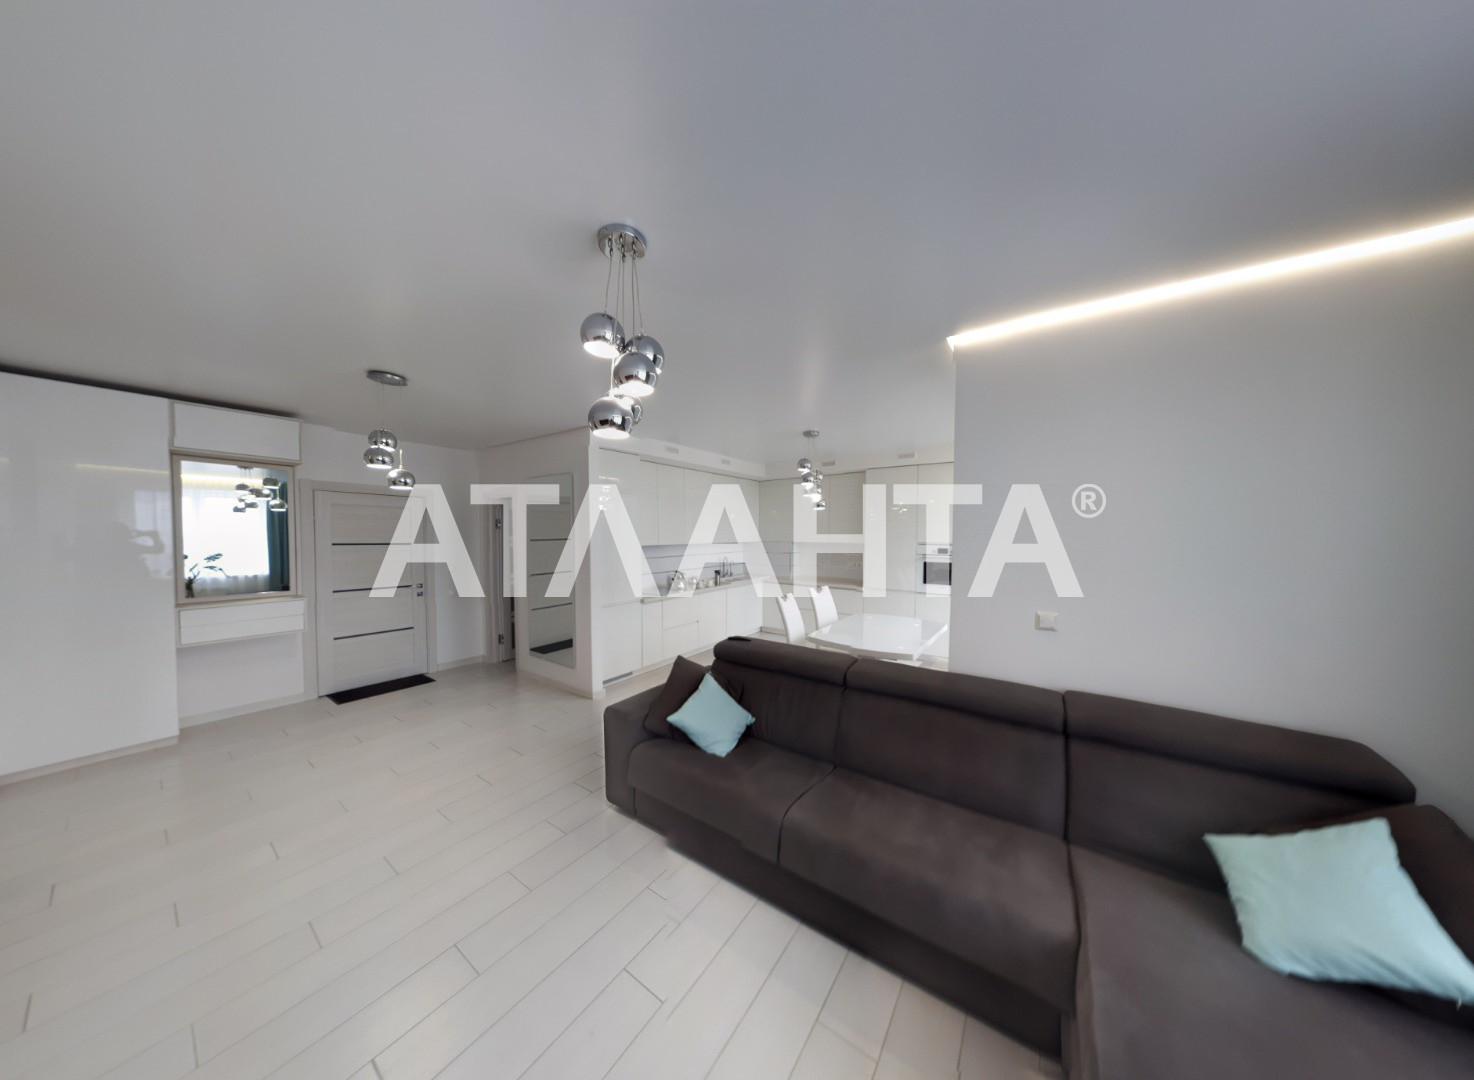 Продается 3-комнатная Квартира на ул. Просп. Глушкова — 160 000 у.е.